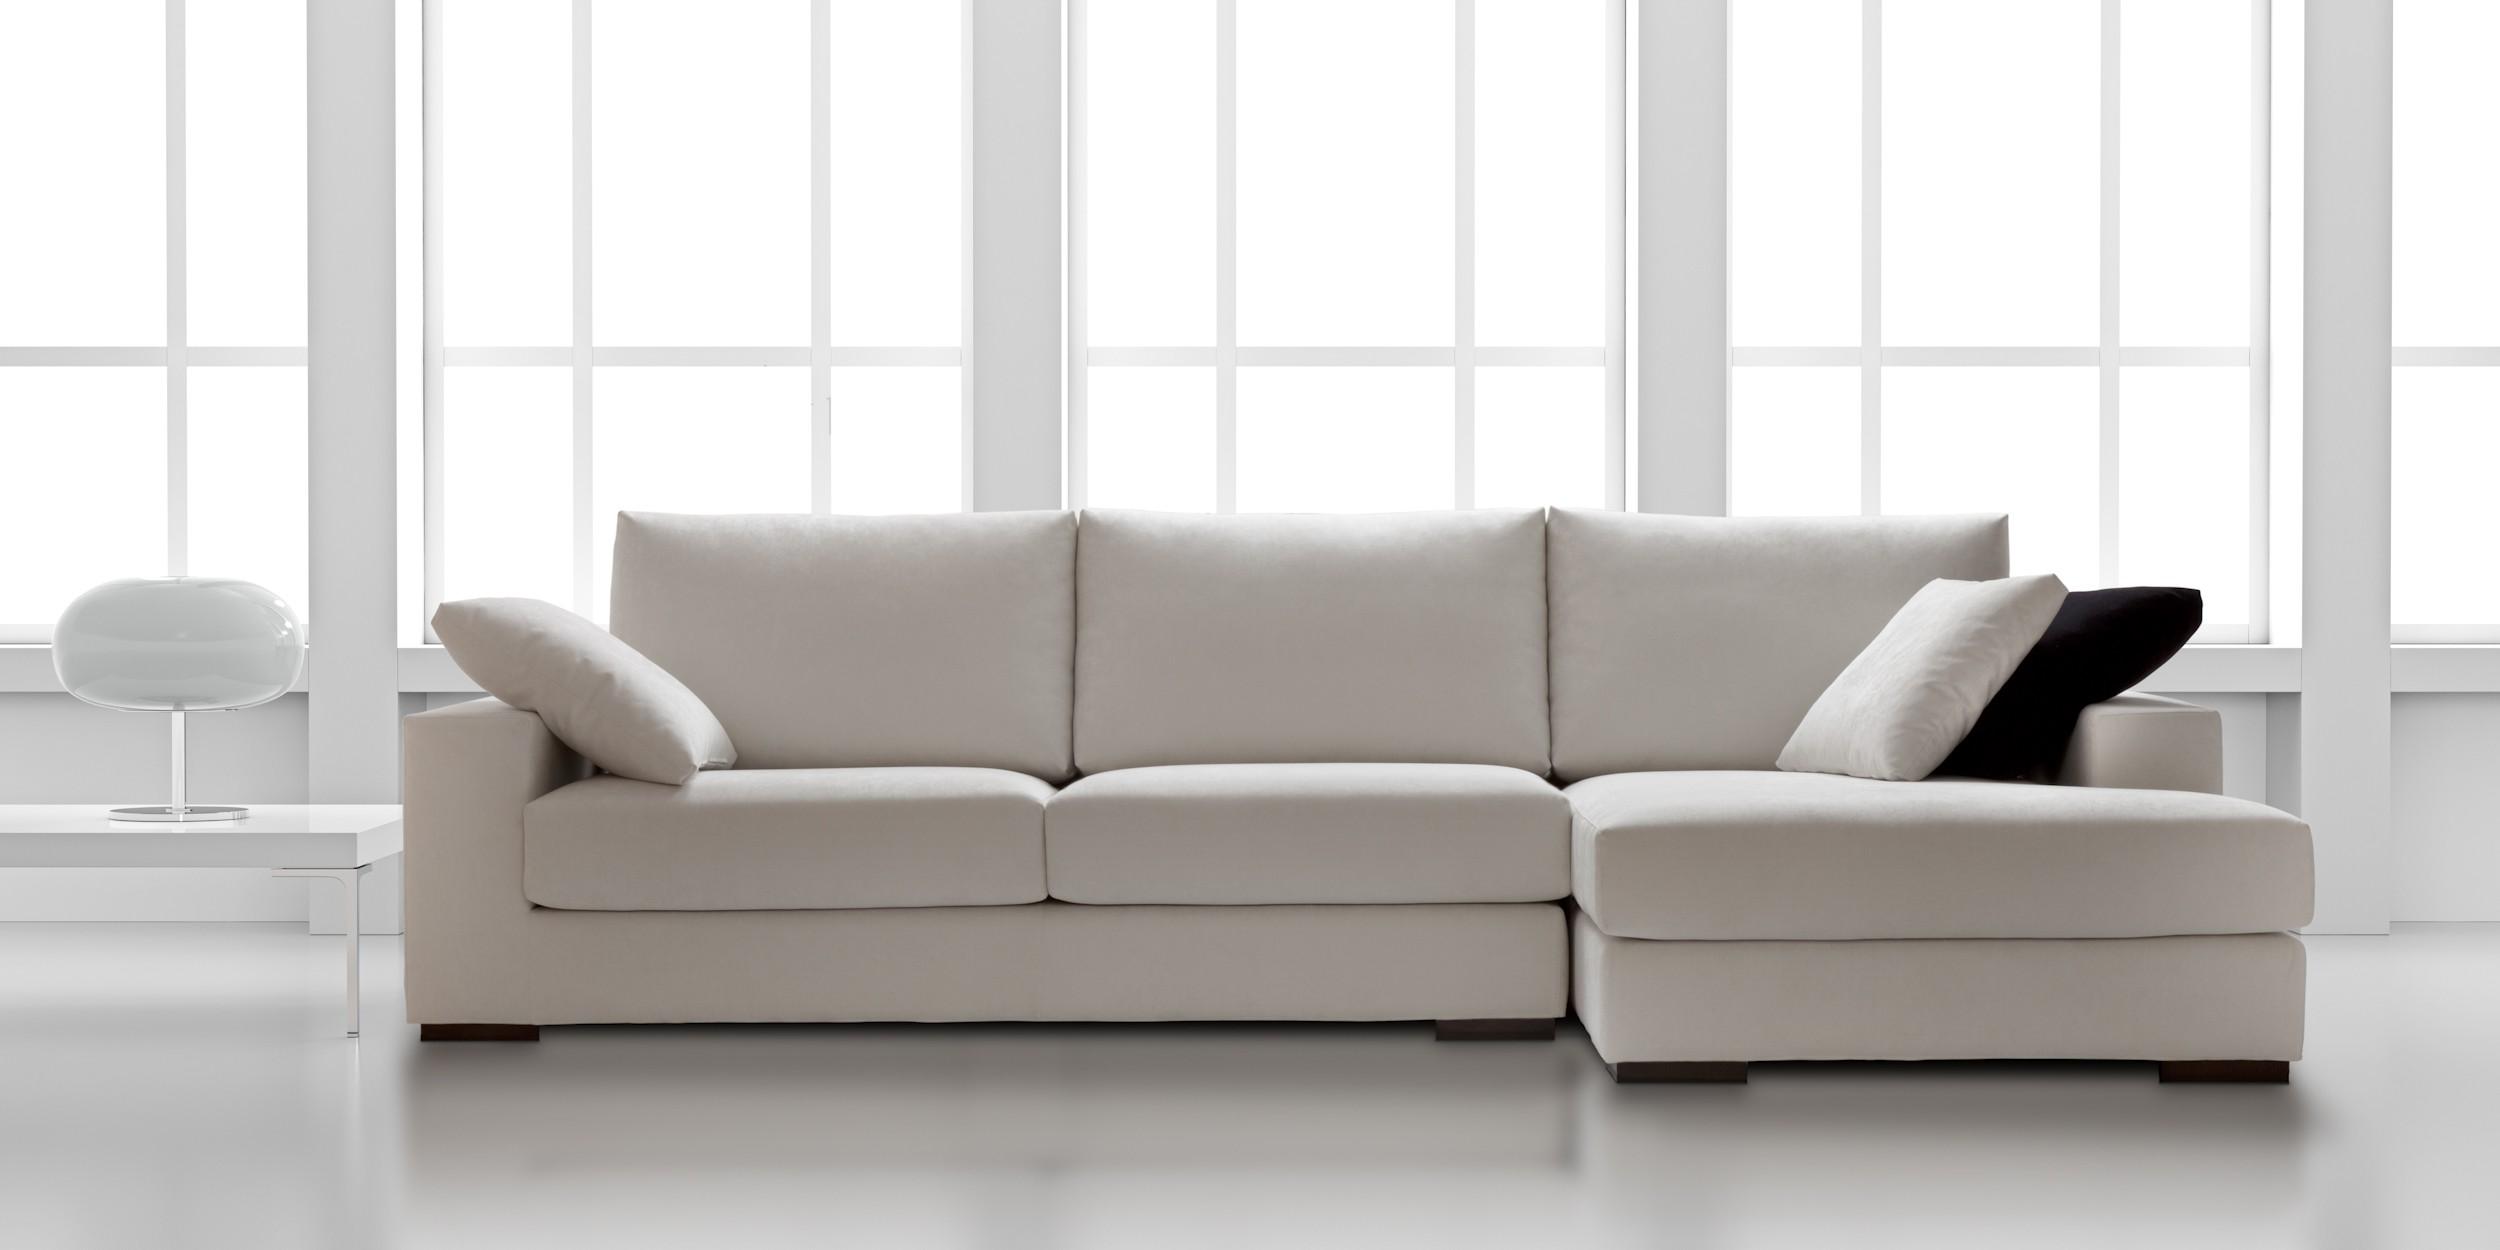 The sofa company las rozas the sofa company las rozas - Sofas en europolis ...